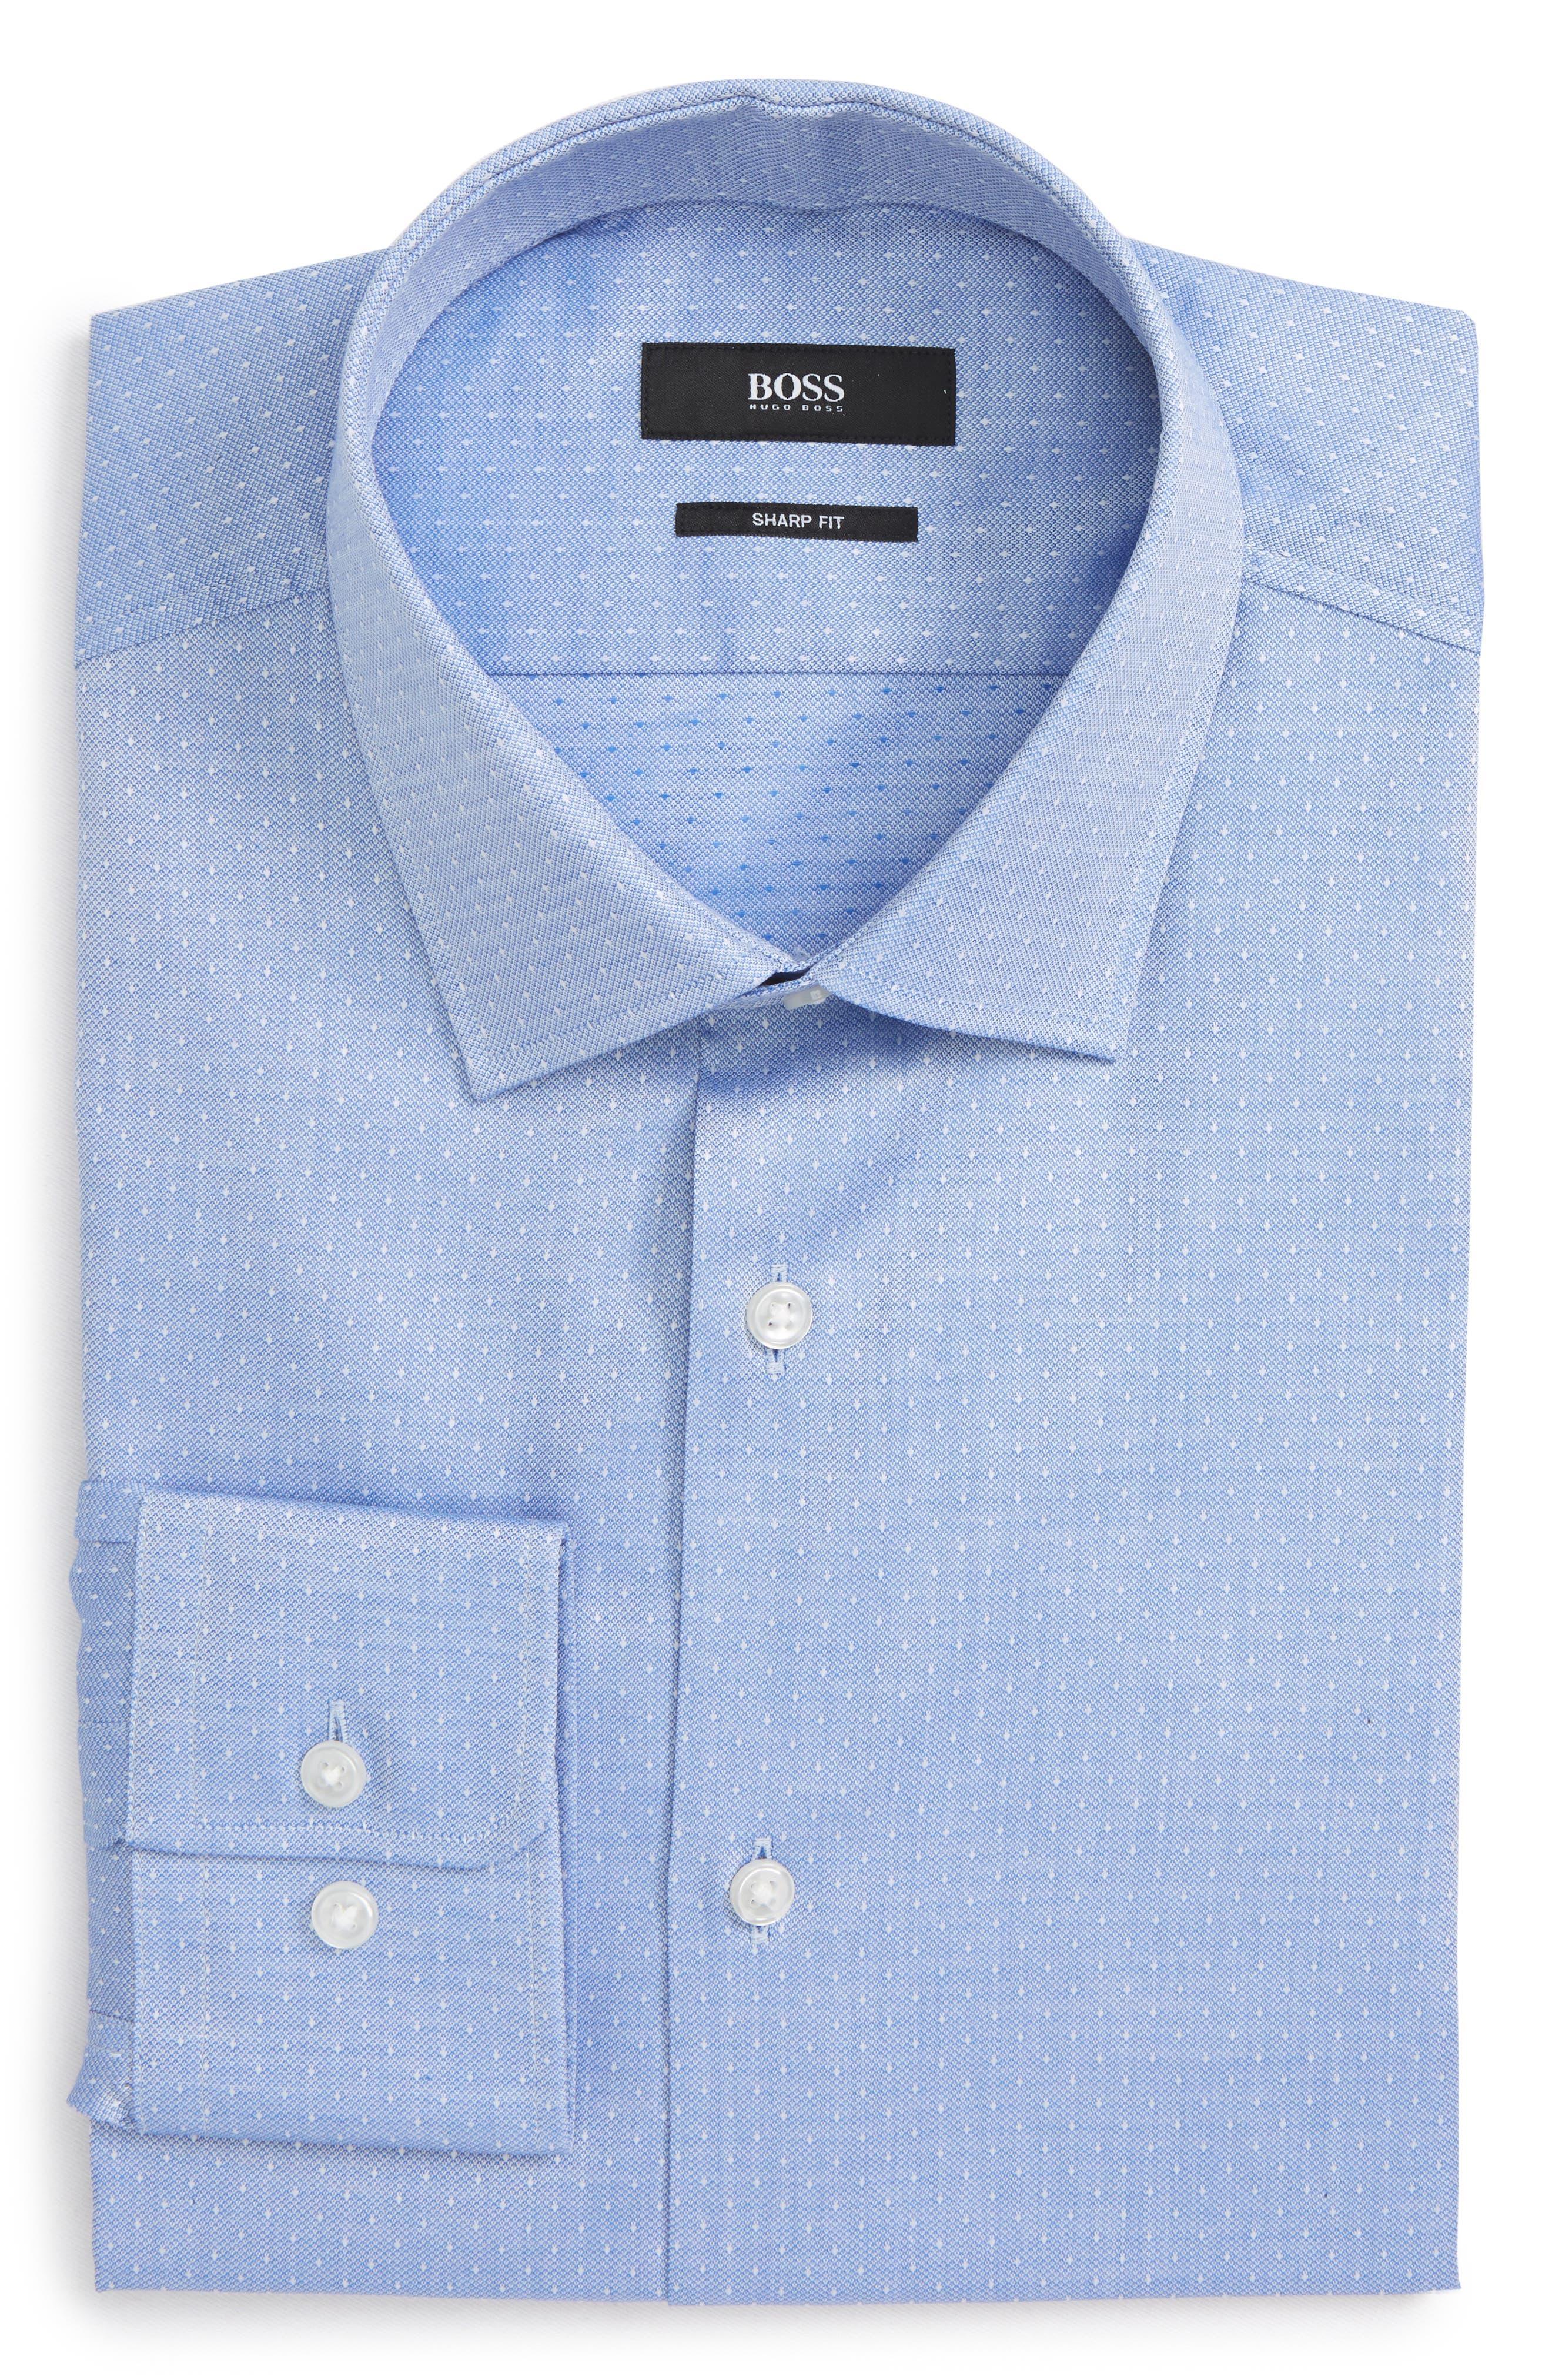 Mark Sharp Fit Dress Shirt,                             Main thumbnail 1, color,                             Blue